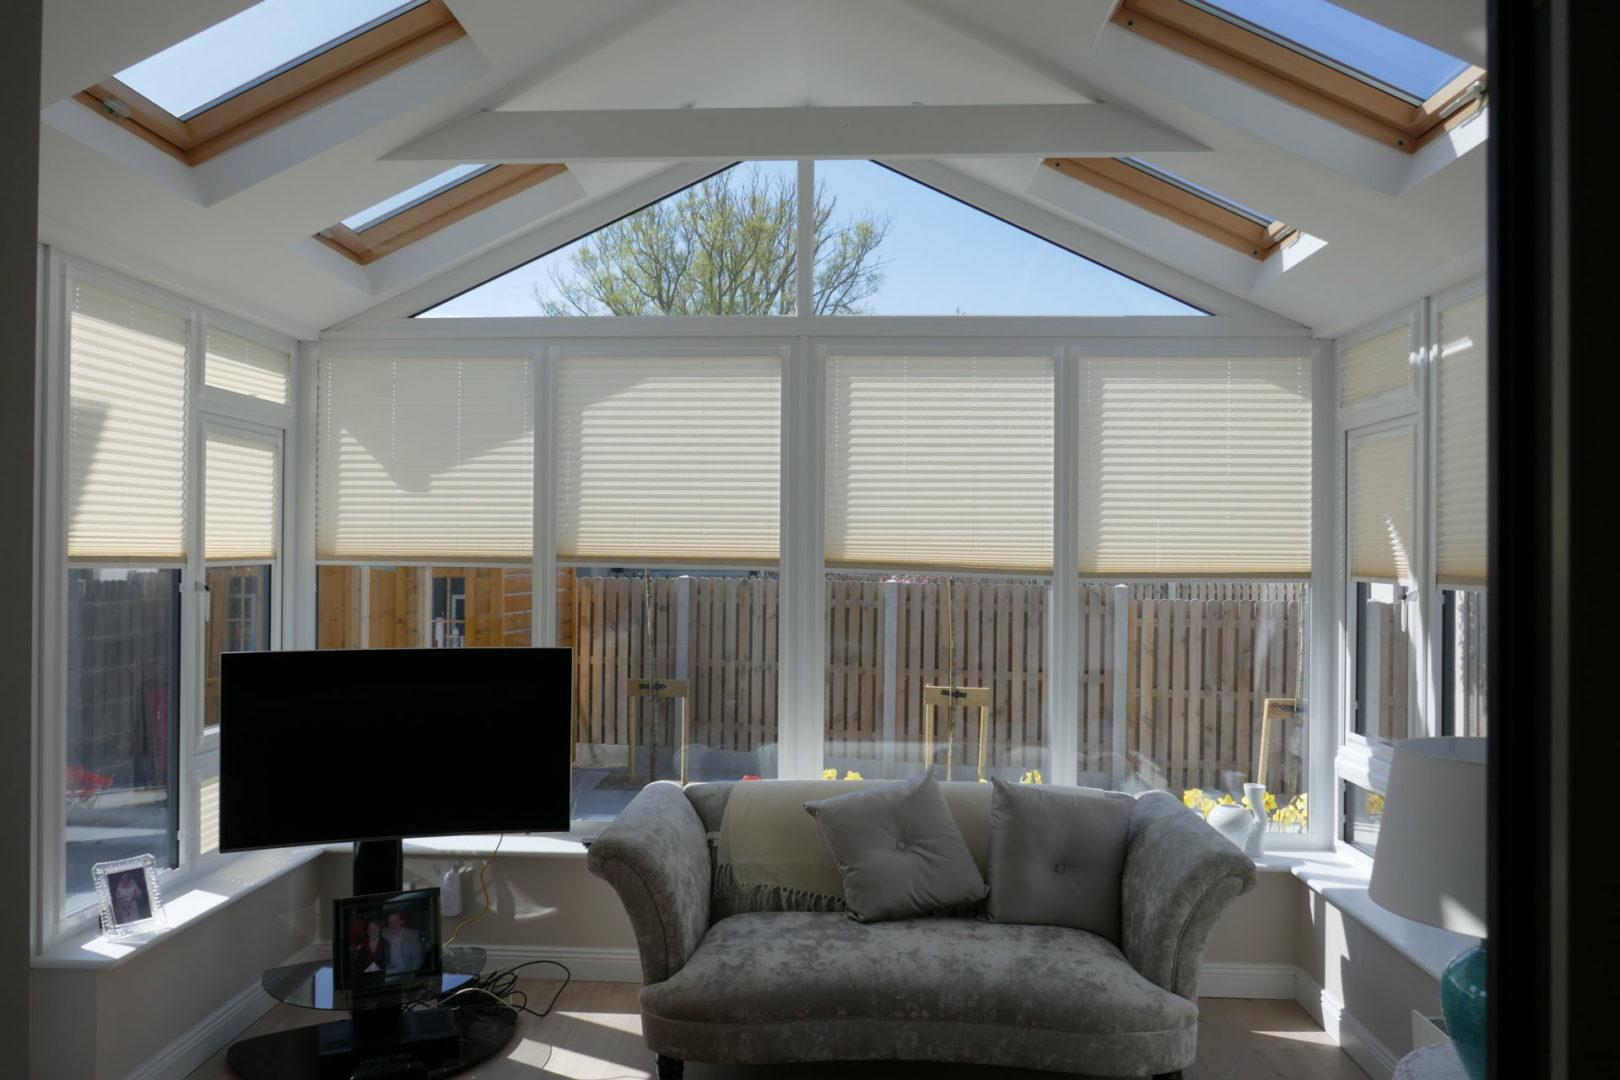 Beam Painted White and Pine Roof Windows